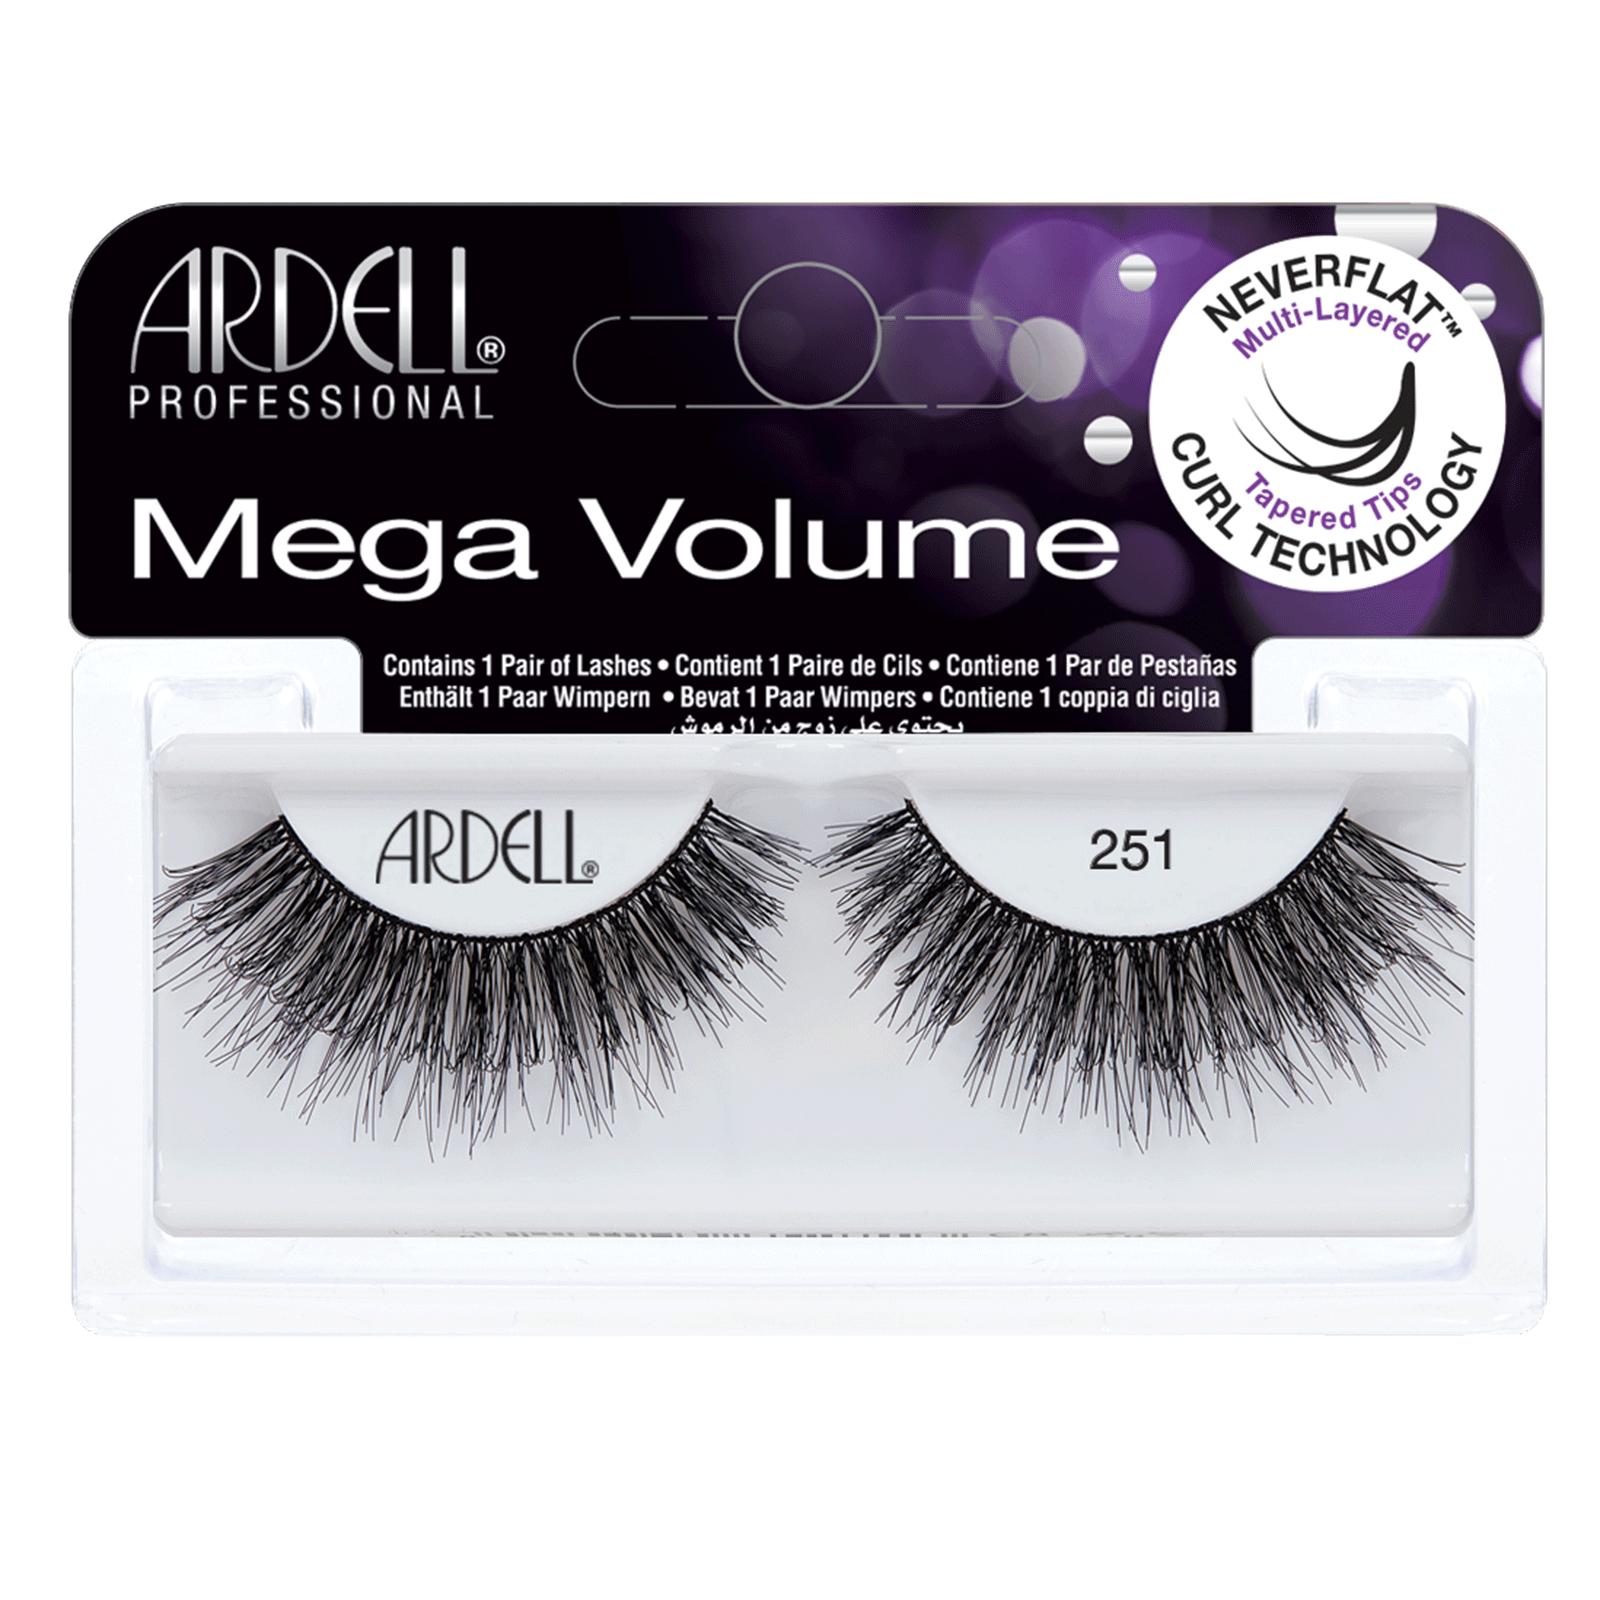 88f19014eb4 Mega Volume #251 - Ardell | CosmoProf